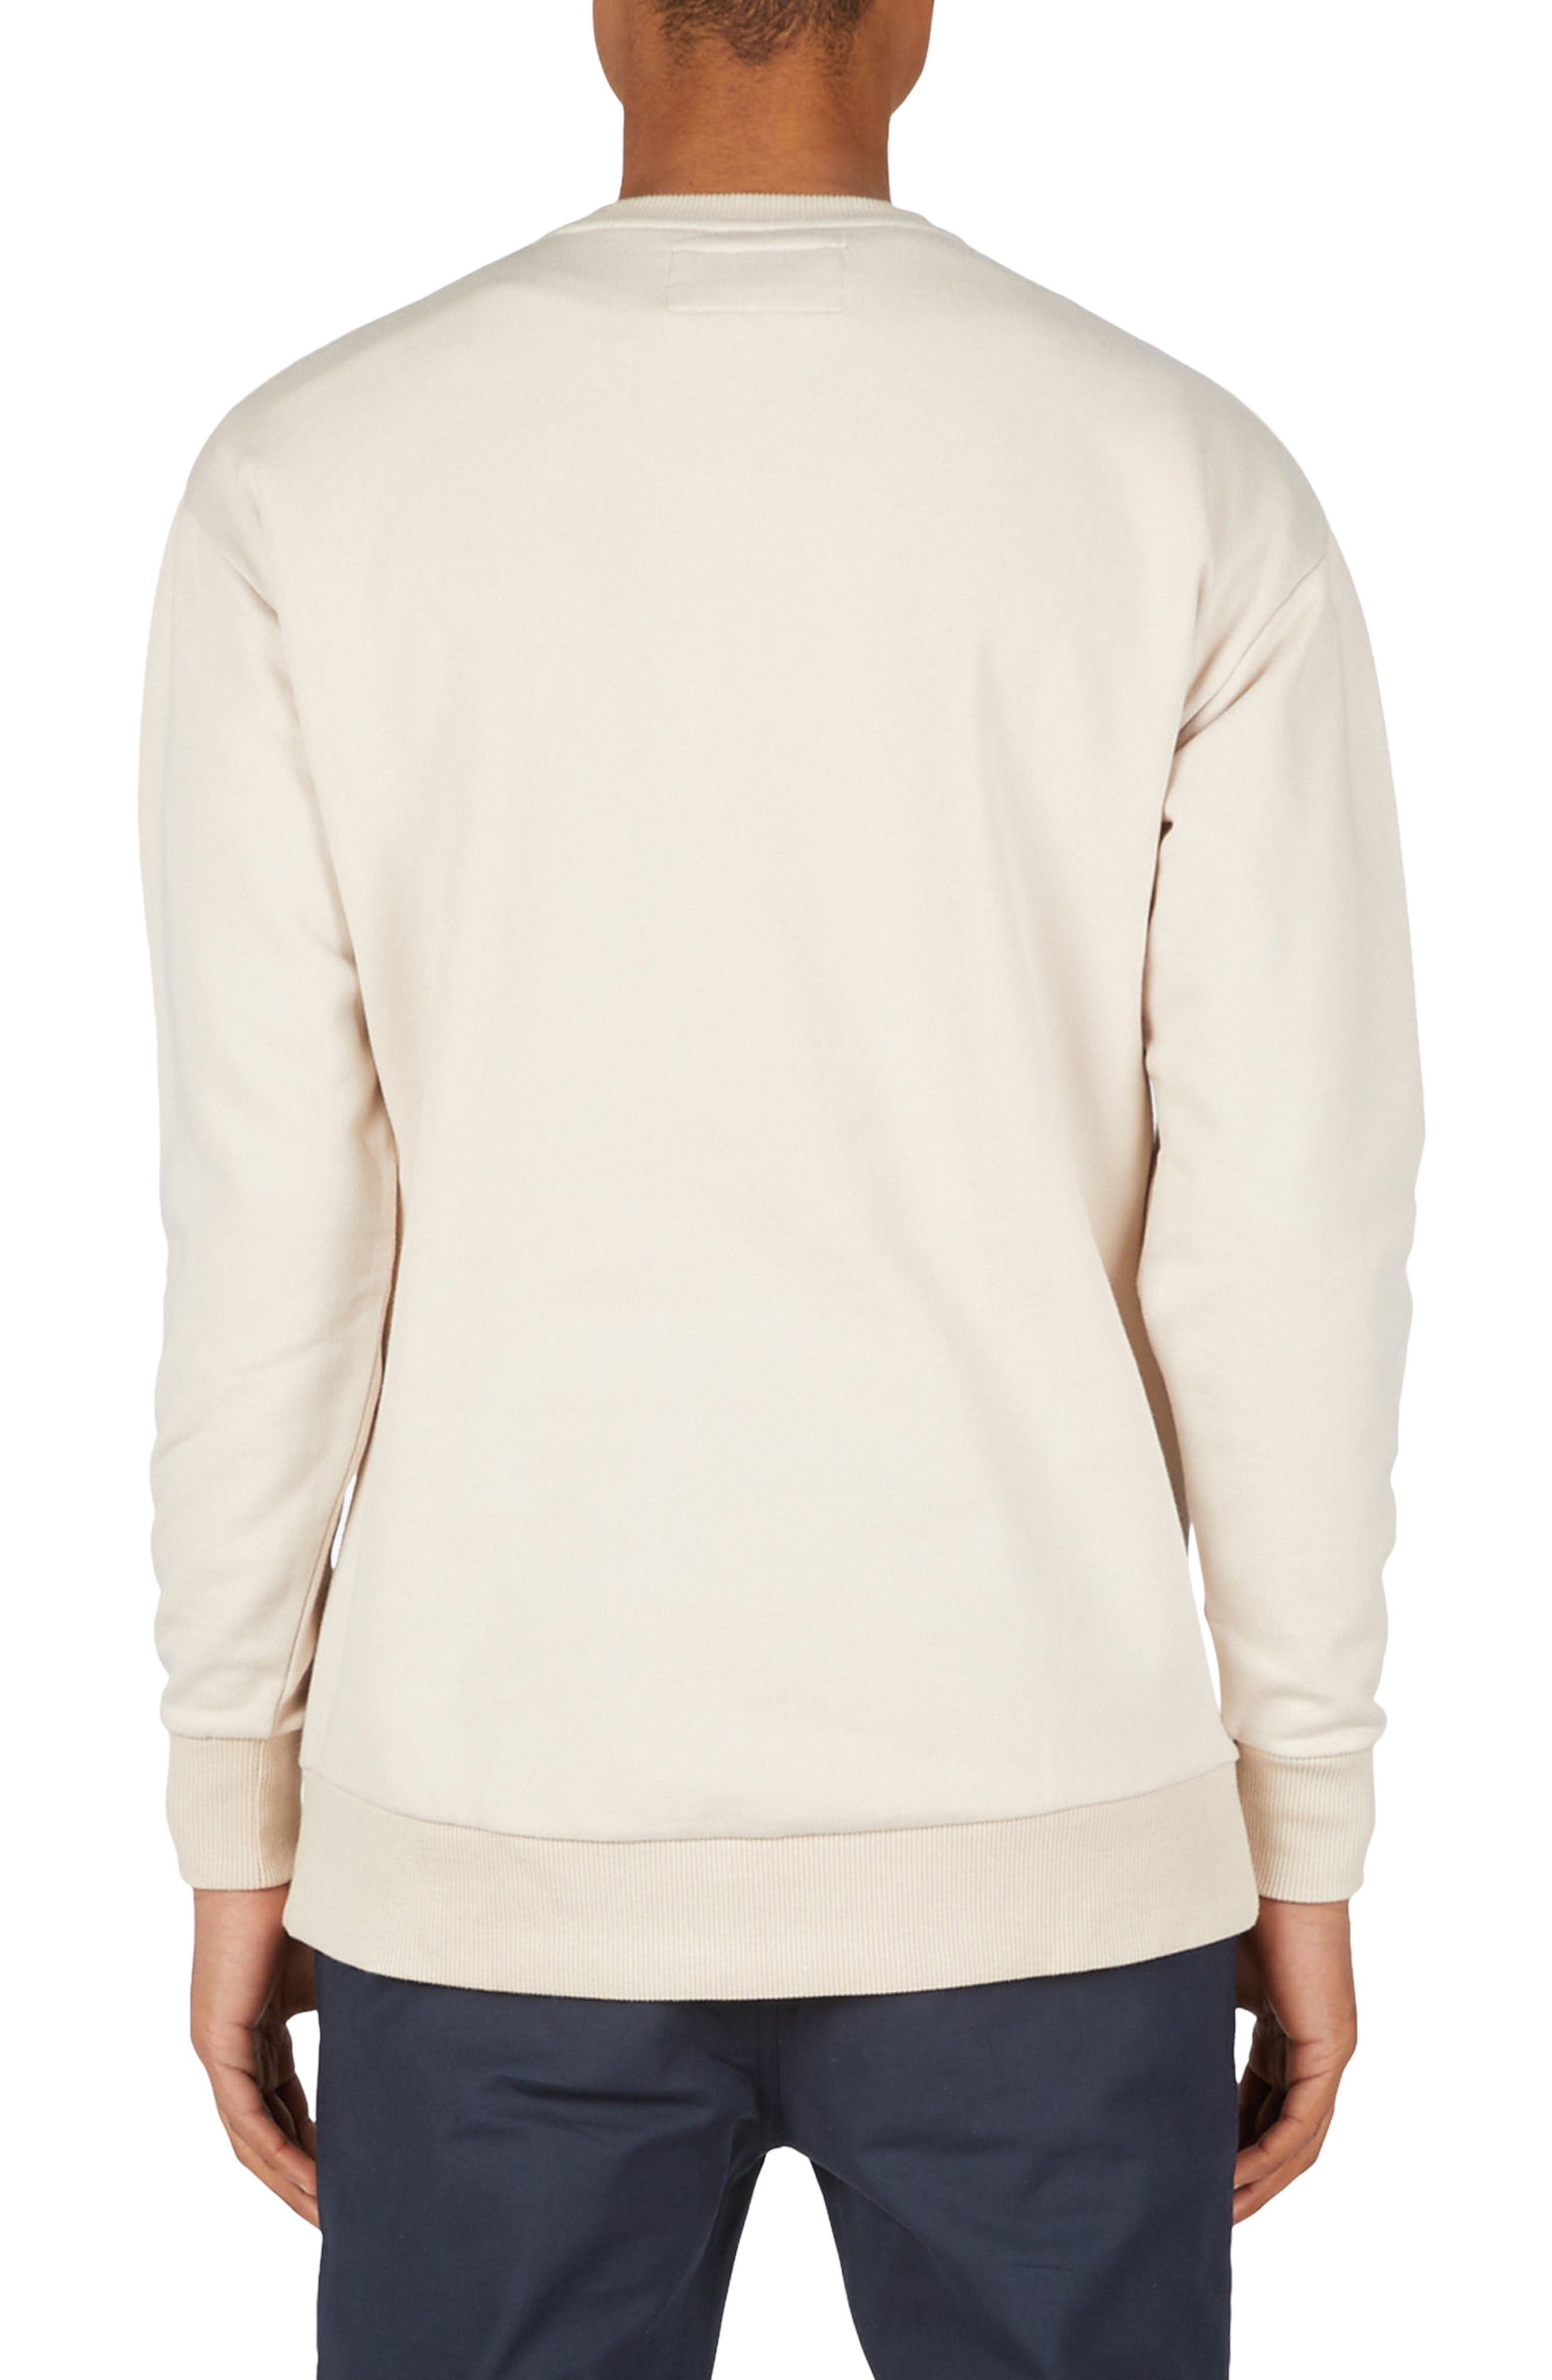 Sponsor Rugger Sweatshirt,                             Alternate thumbnail 2, color,                             901